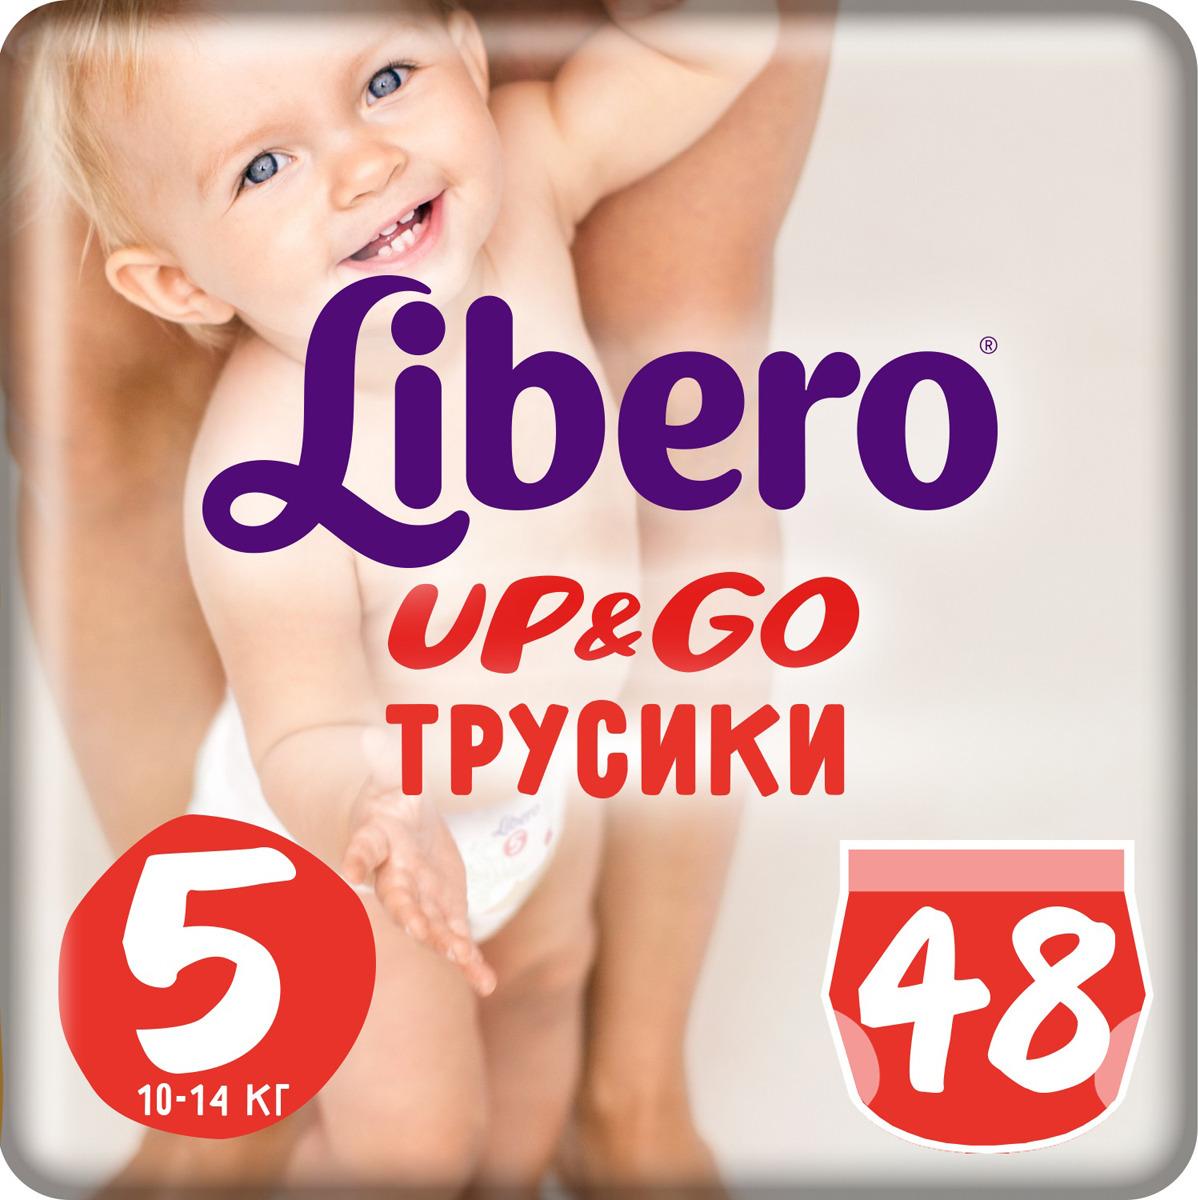 Libero Трусики Up&Go Size 5 (10-14 кг) 48 шт libero трусики up